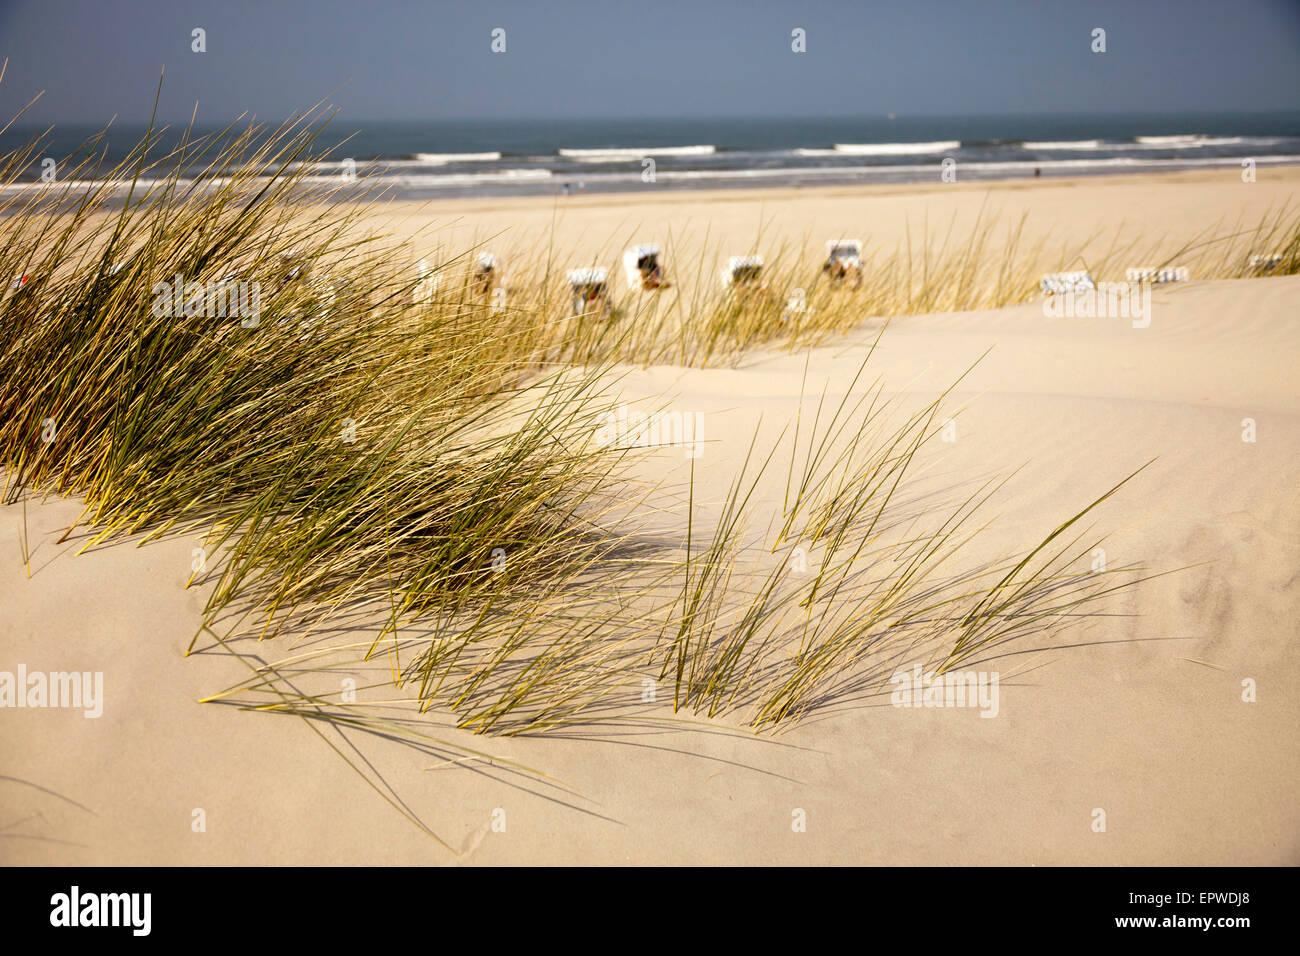 dunes and the main beach, East Frisian Island Spiekeroog, Lower Saxony, Germany Stock Photo